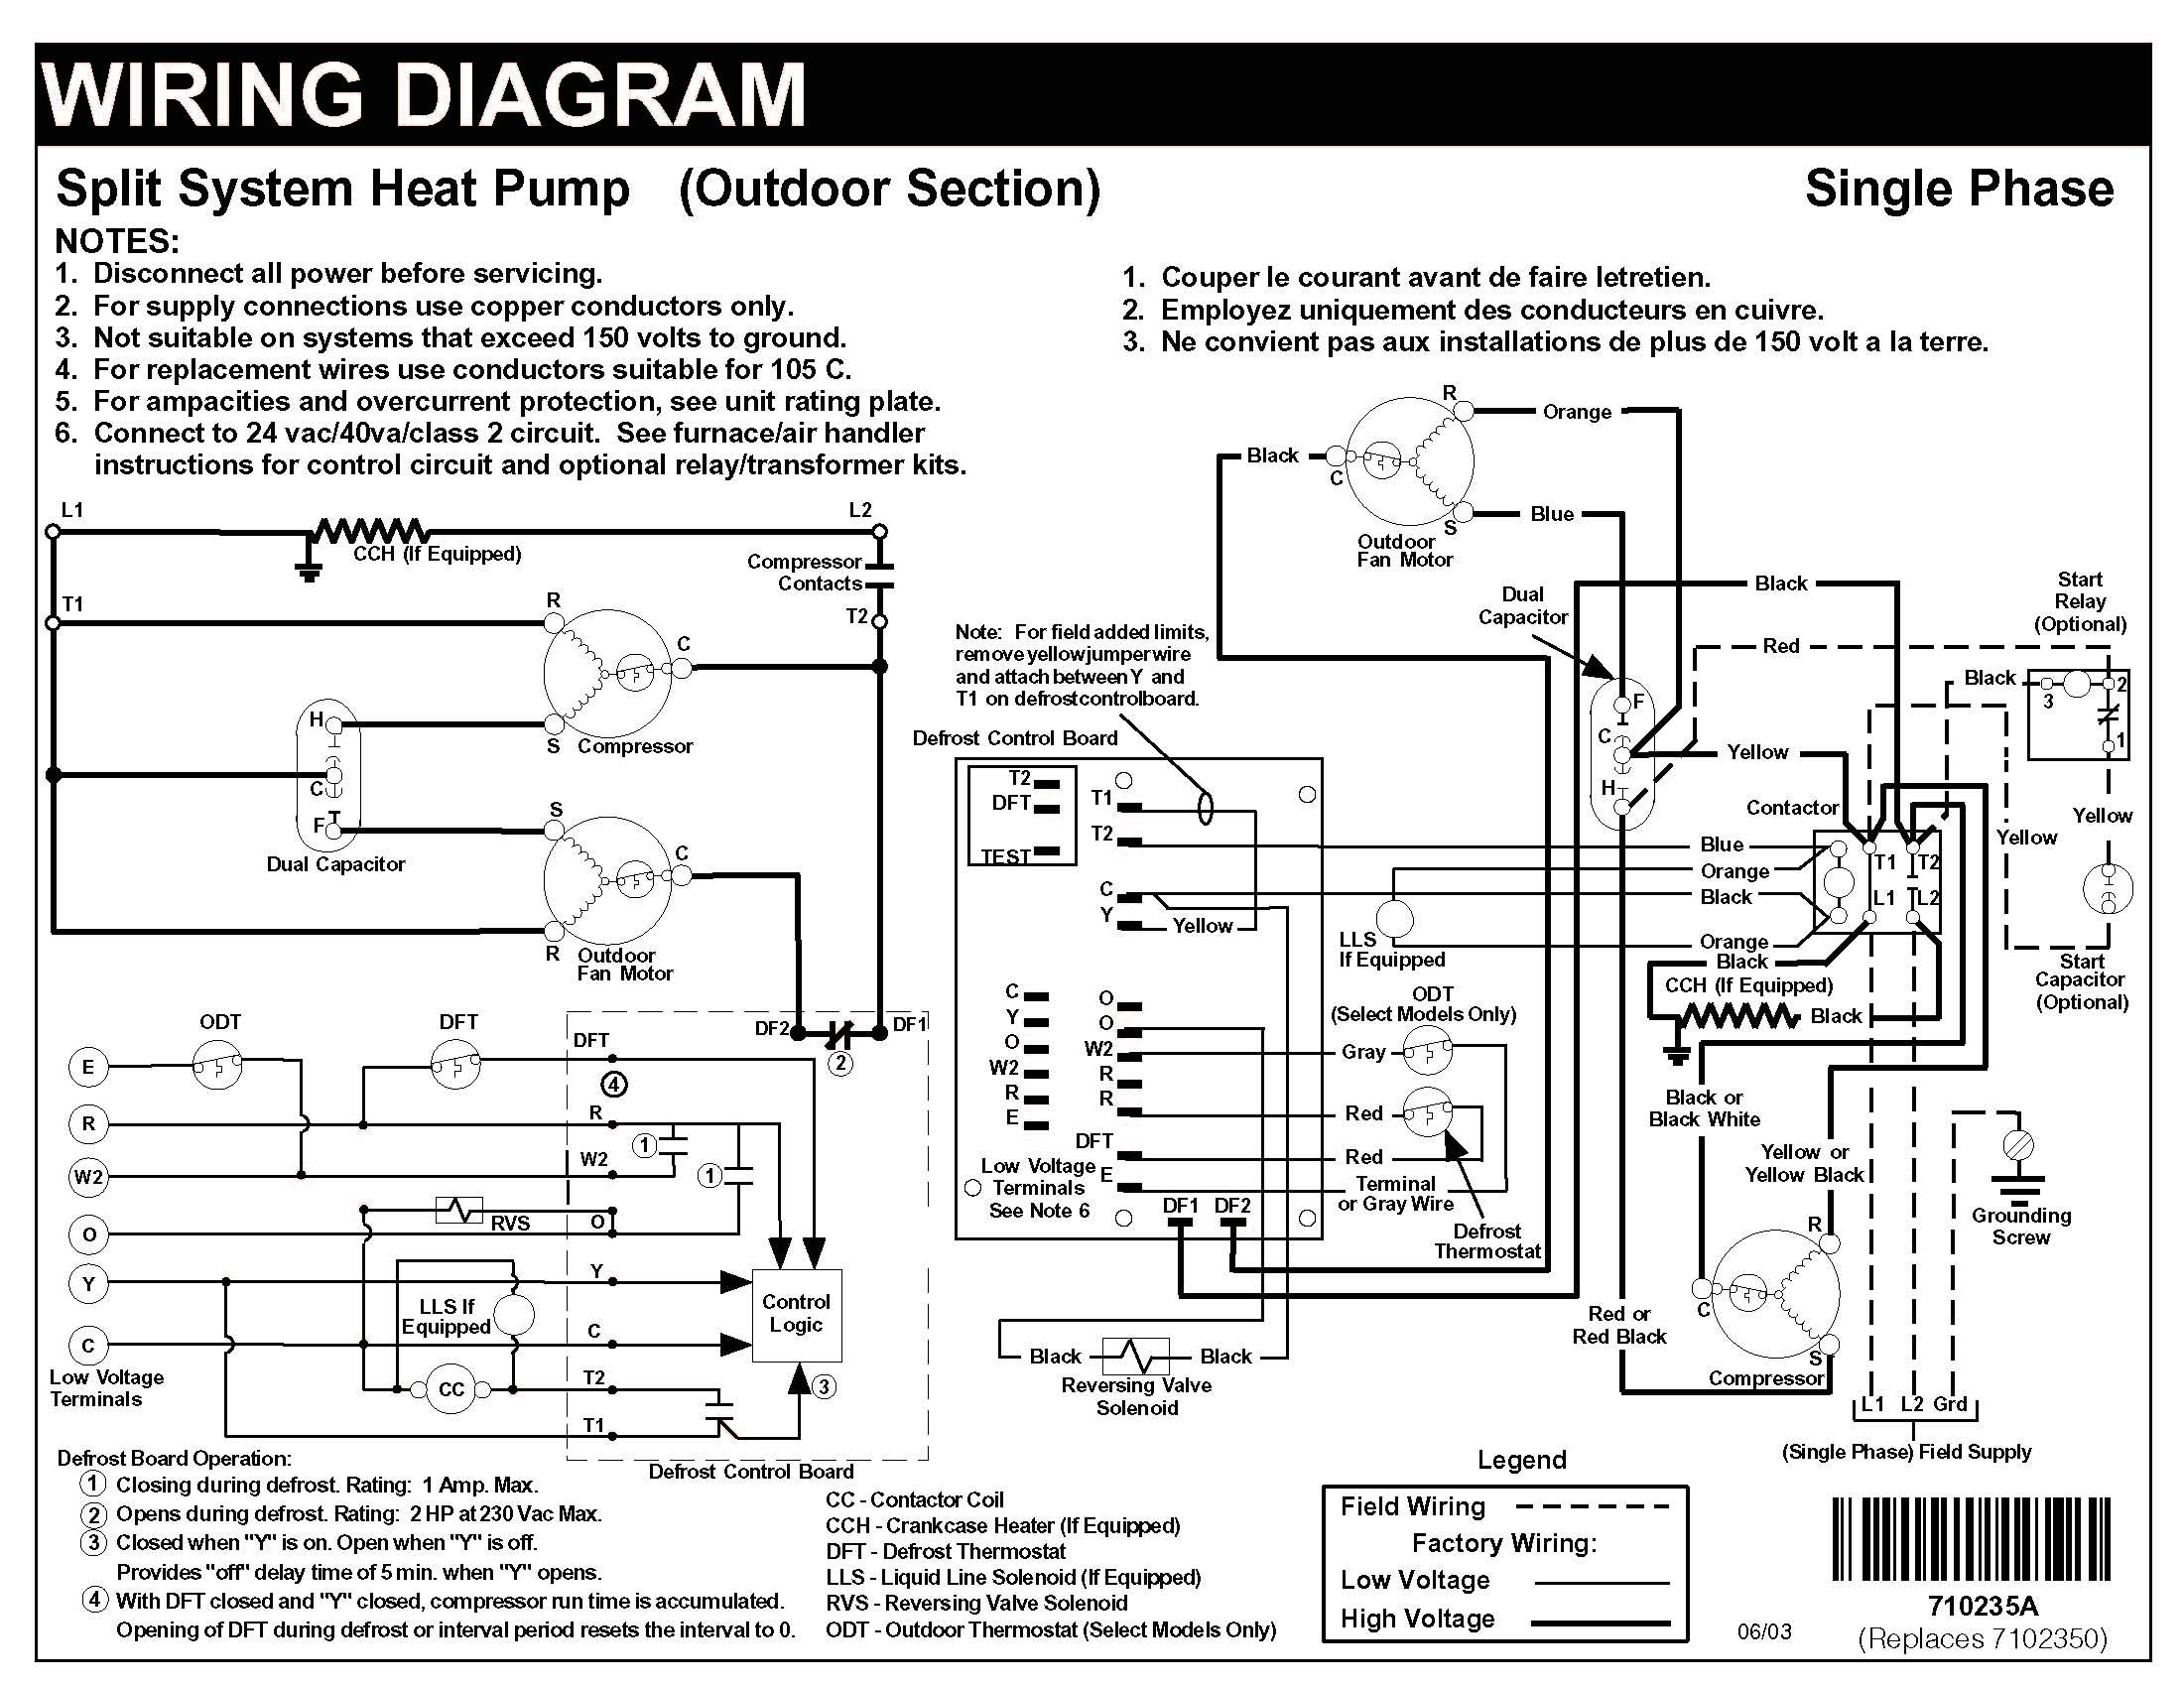 Old Lennox Wiring Diagram Hs254611p. . Wiring Diagram on